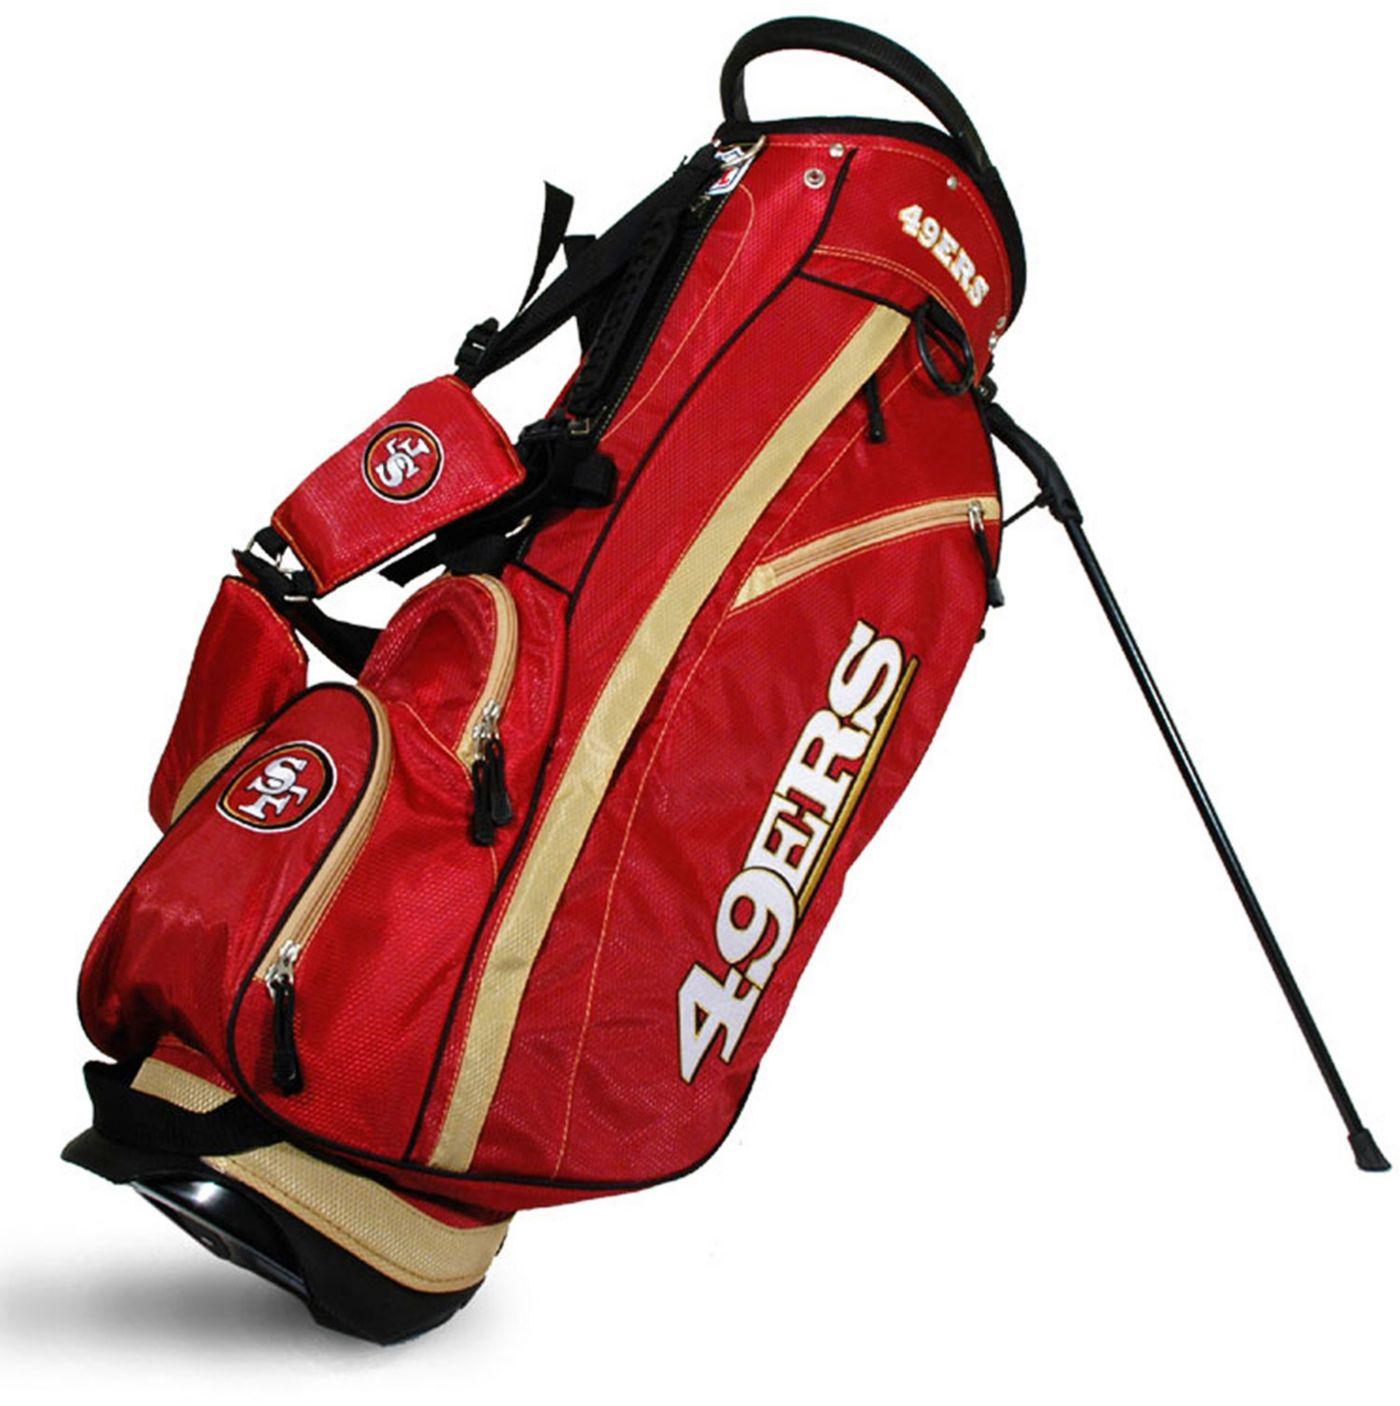 Team Golf Fairway San Francisco 49ers Stand Bag